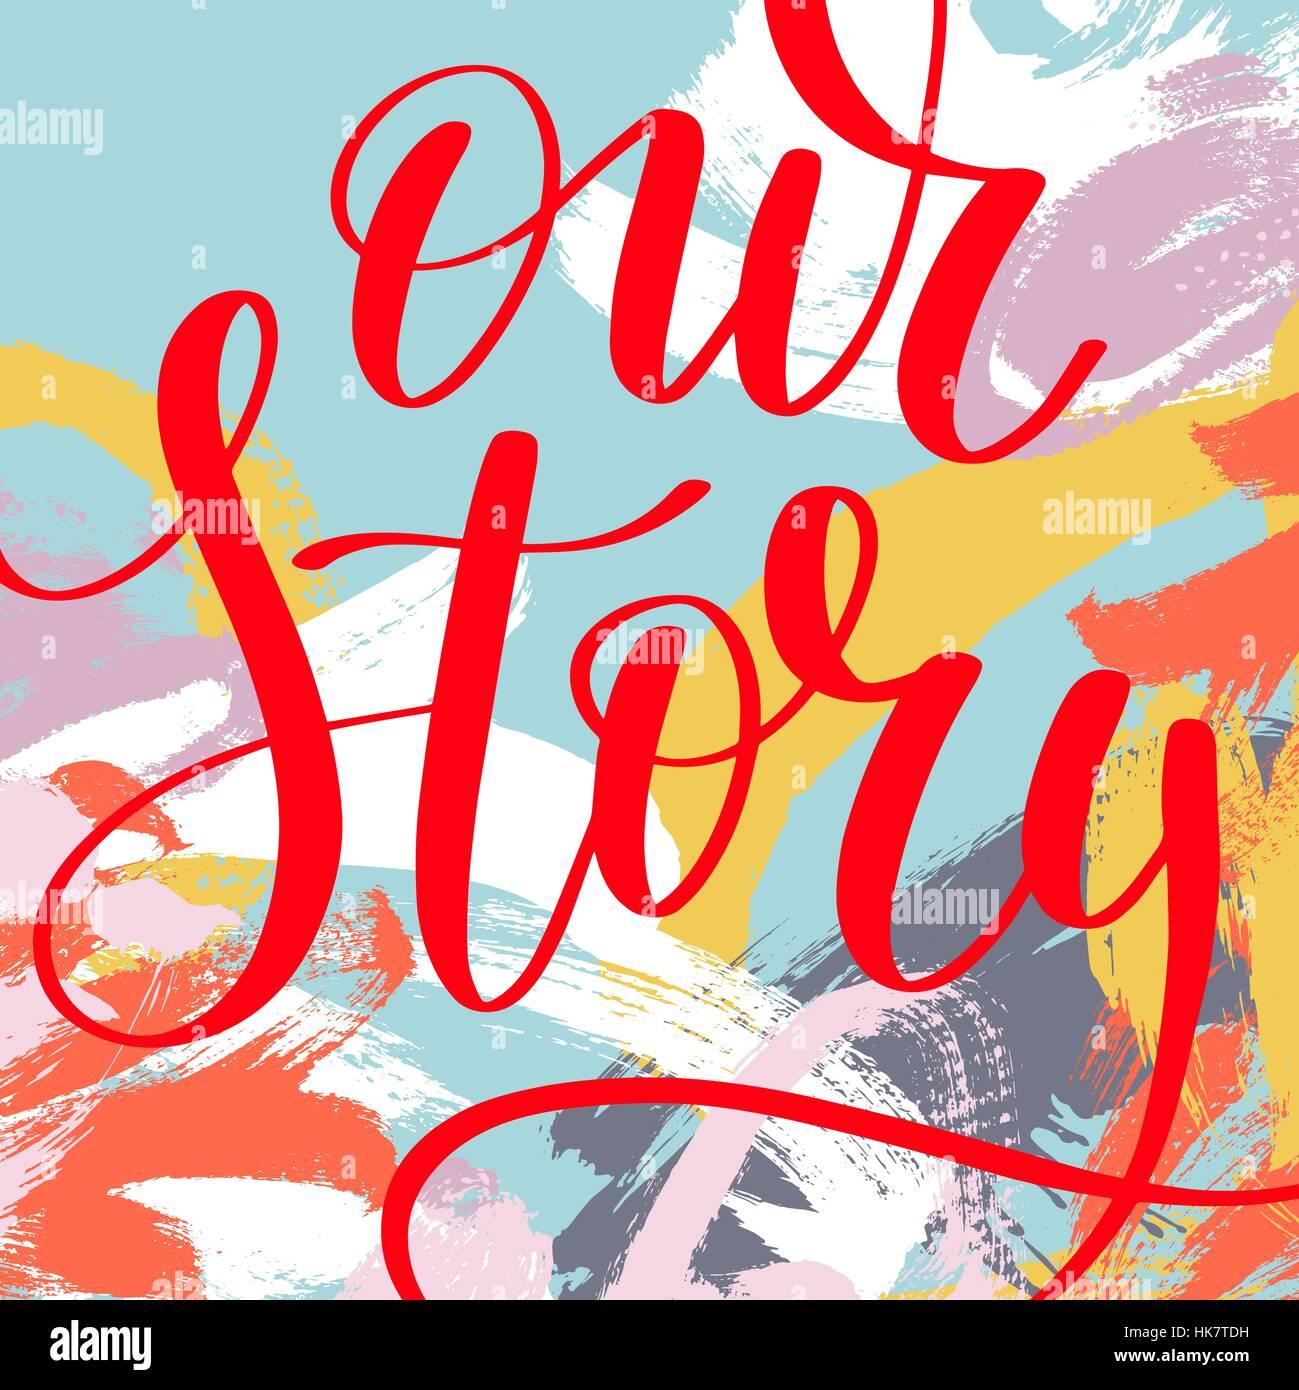 love in la story